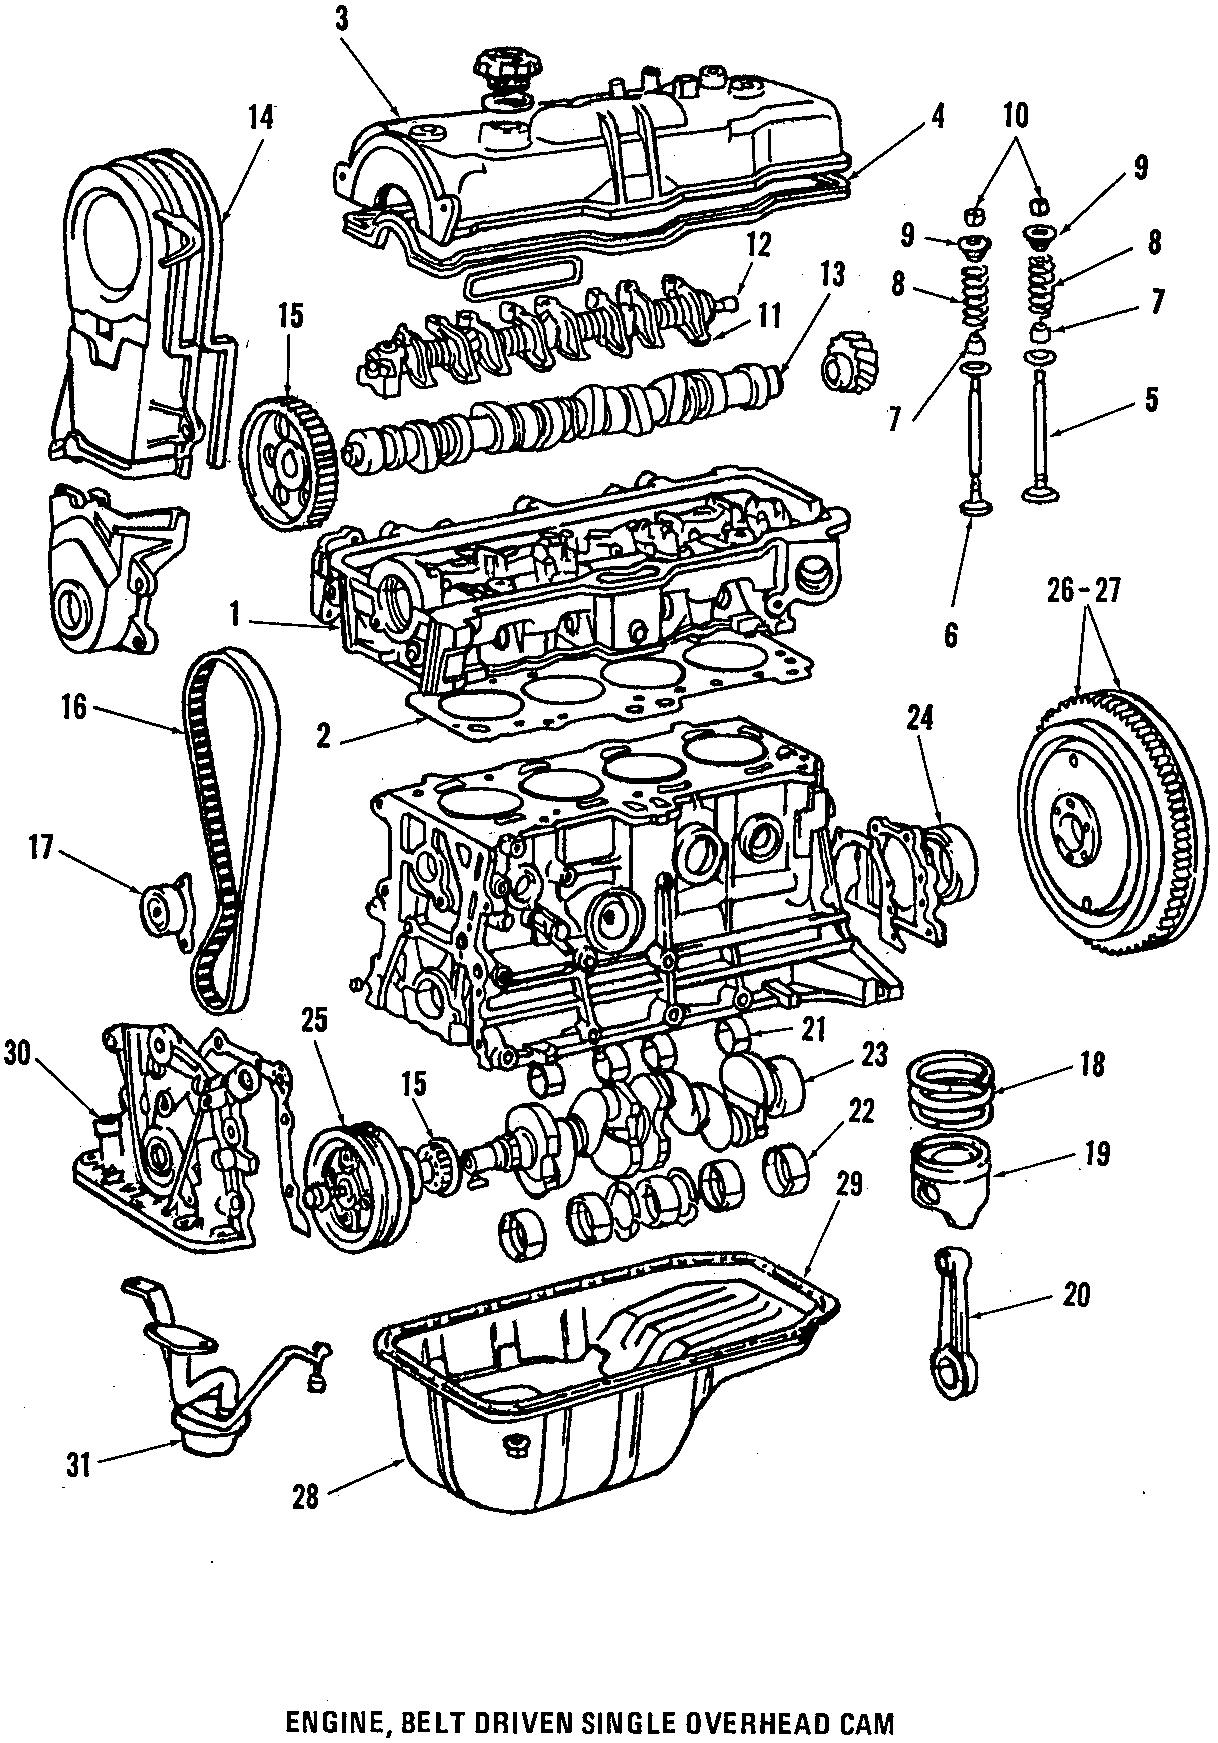 Toyota Corolla Fx D Base Cc Manual Engine